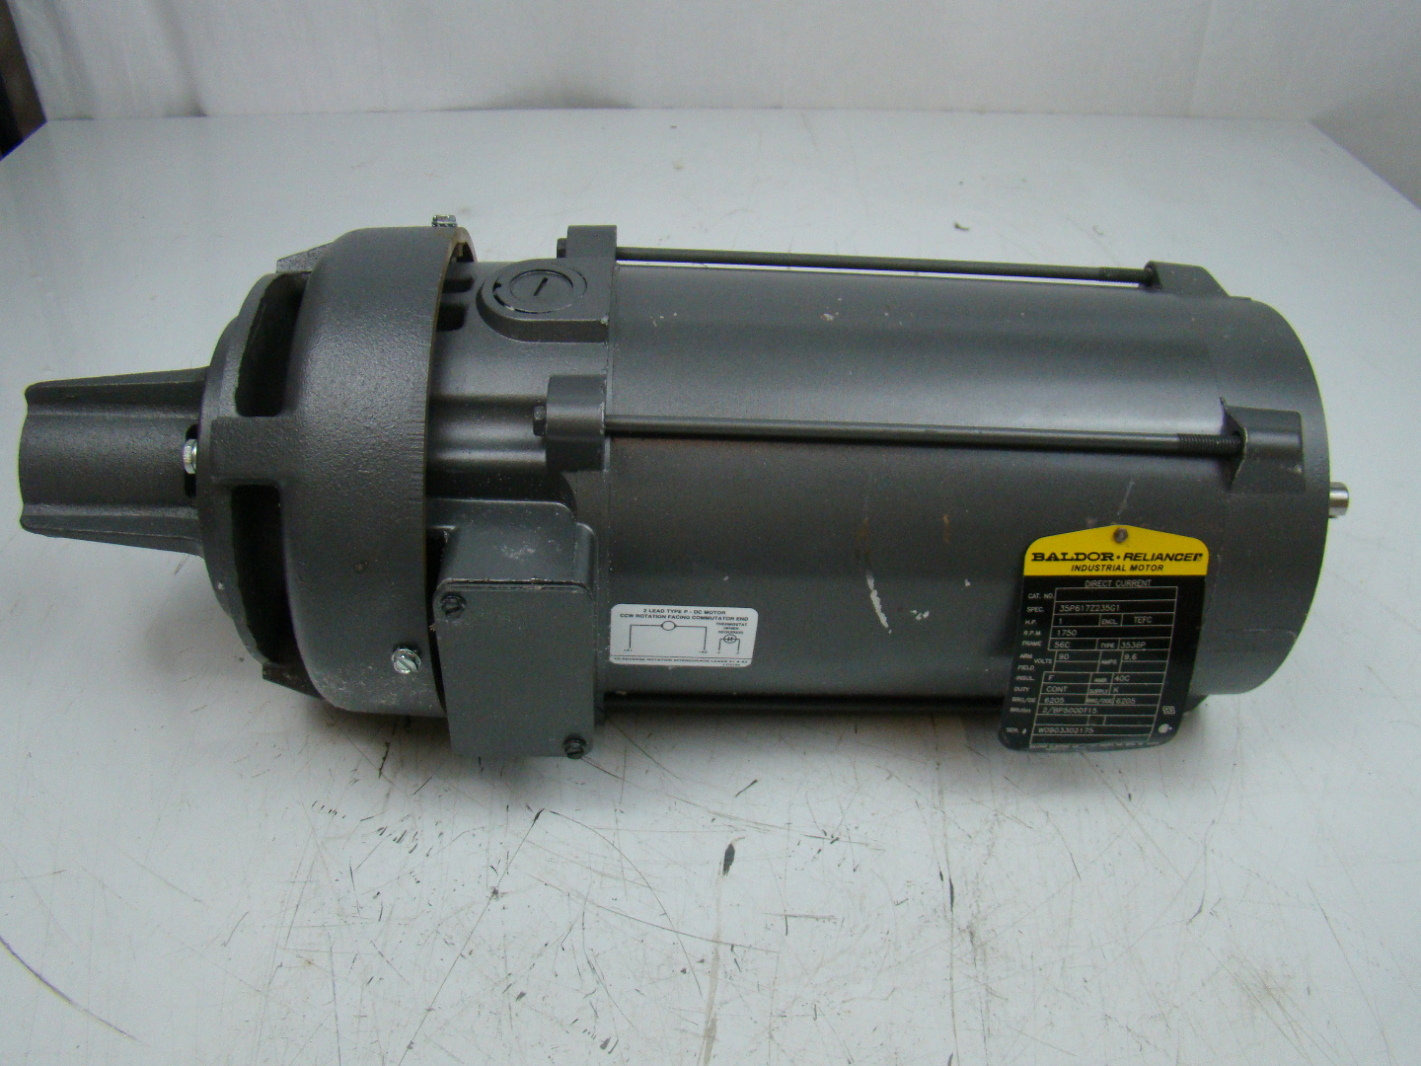 Baldor Reliancer 1hp Dc Electric Motor 90v 35p617z235g1 Ebay